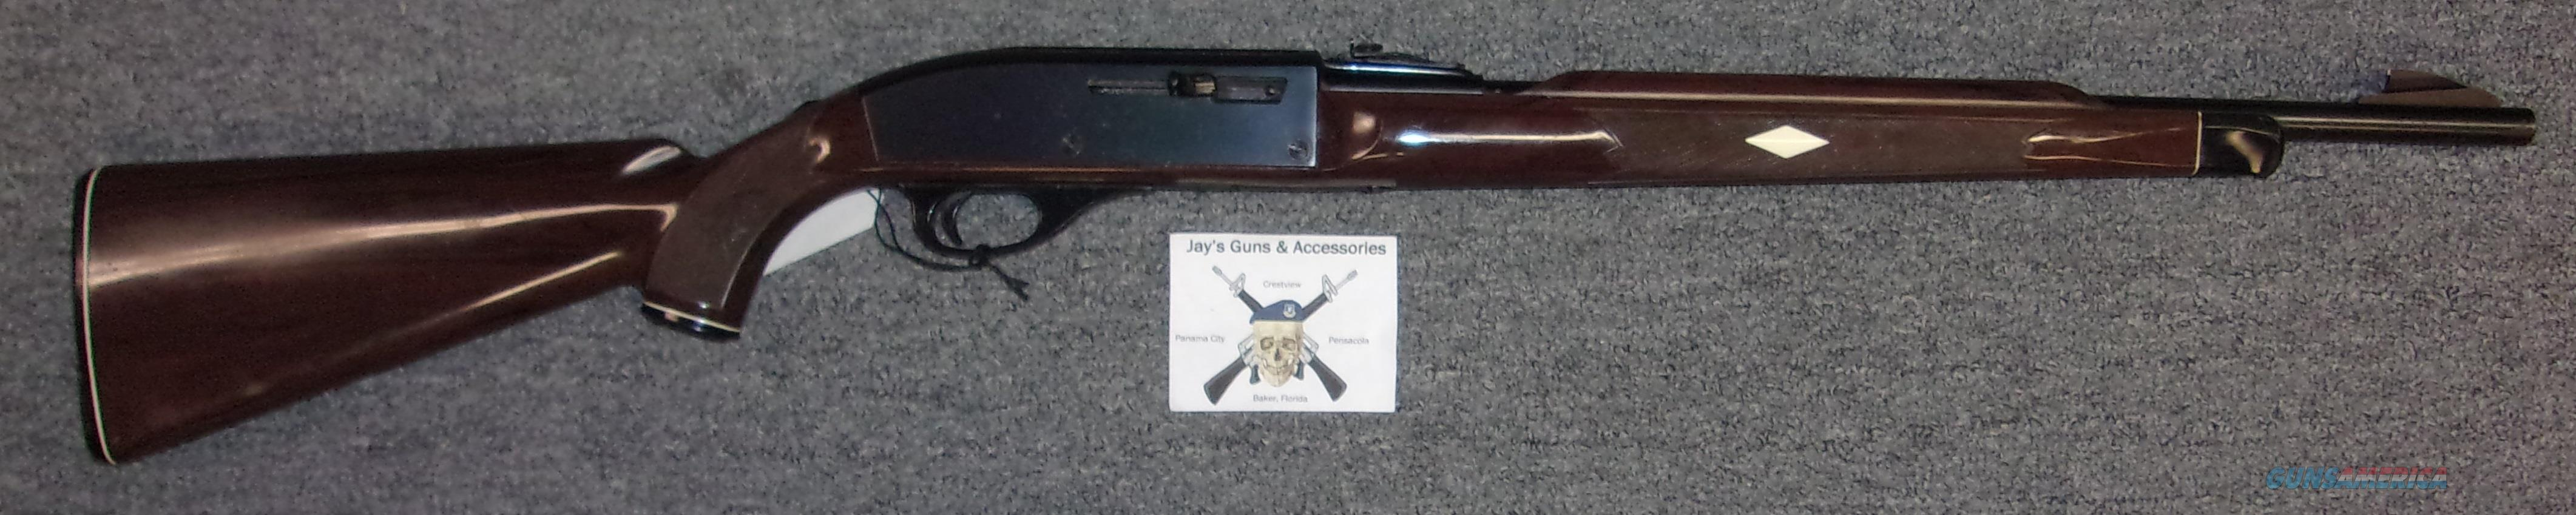 Remington Nylon 66  Guns > Rifles > Remington Rifles - Modern > .22 Rimfire Models